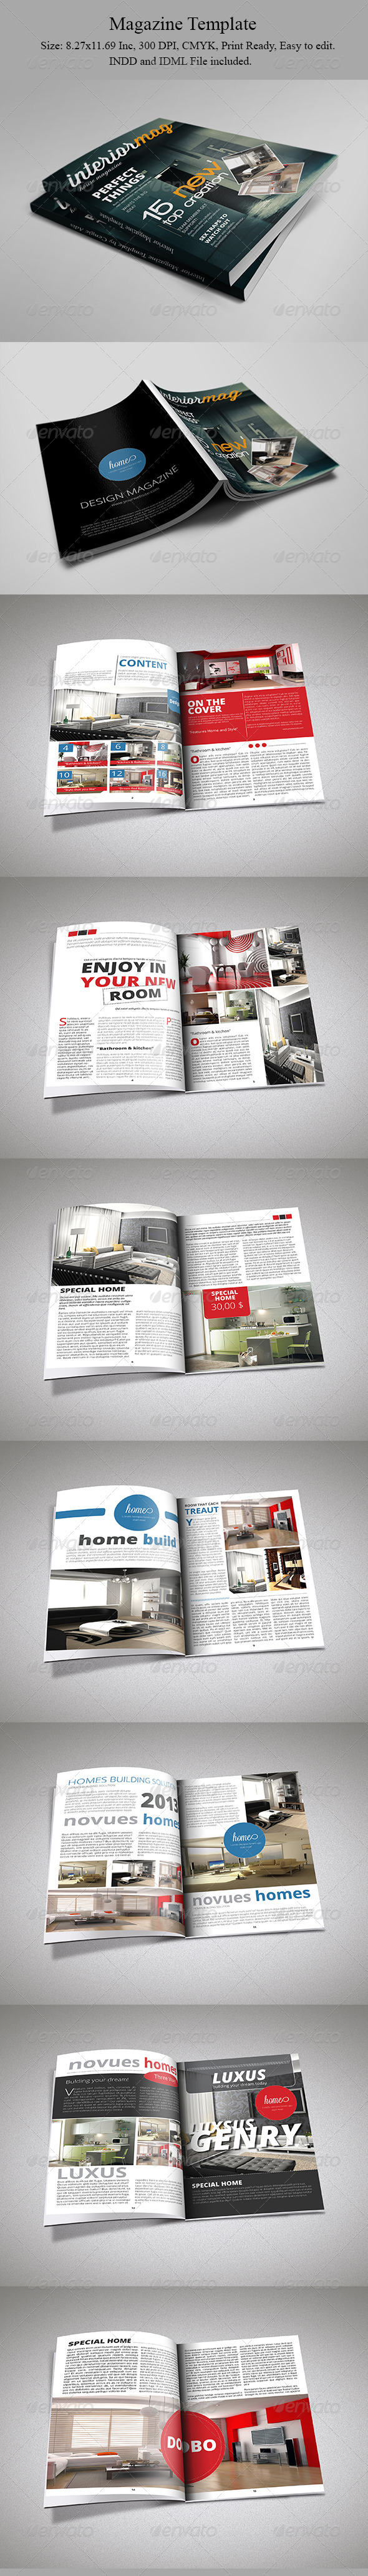 Interior Magazine Template - Magazines Print Templates